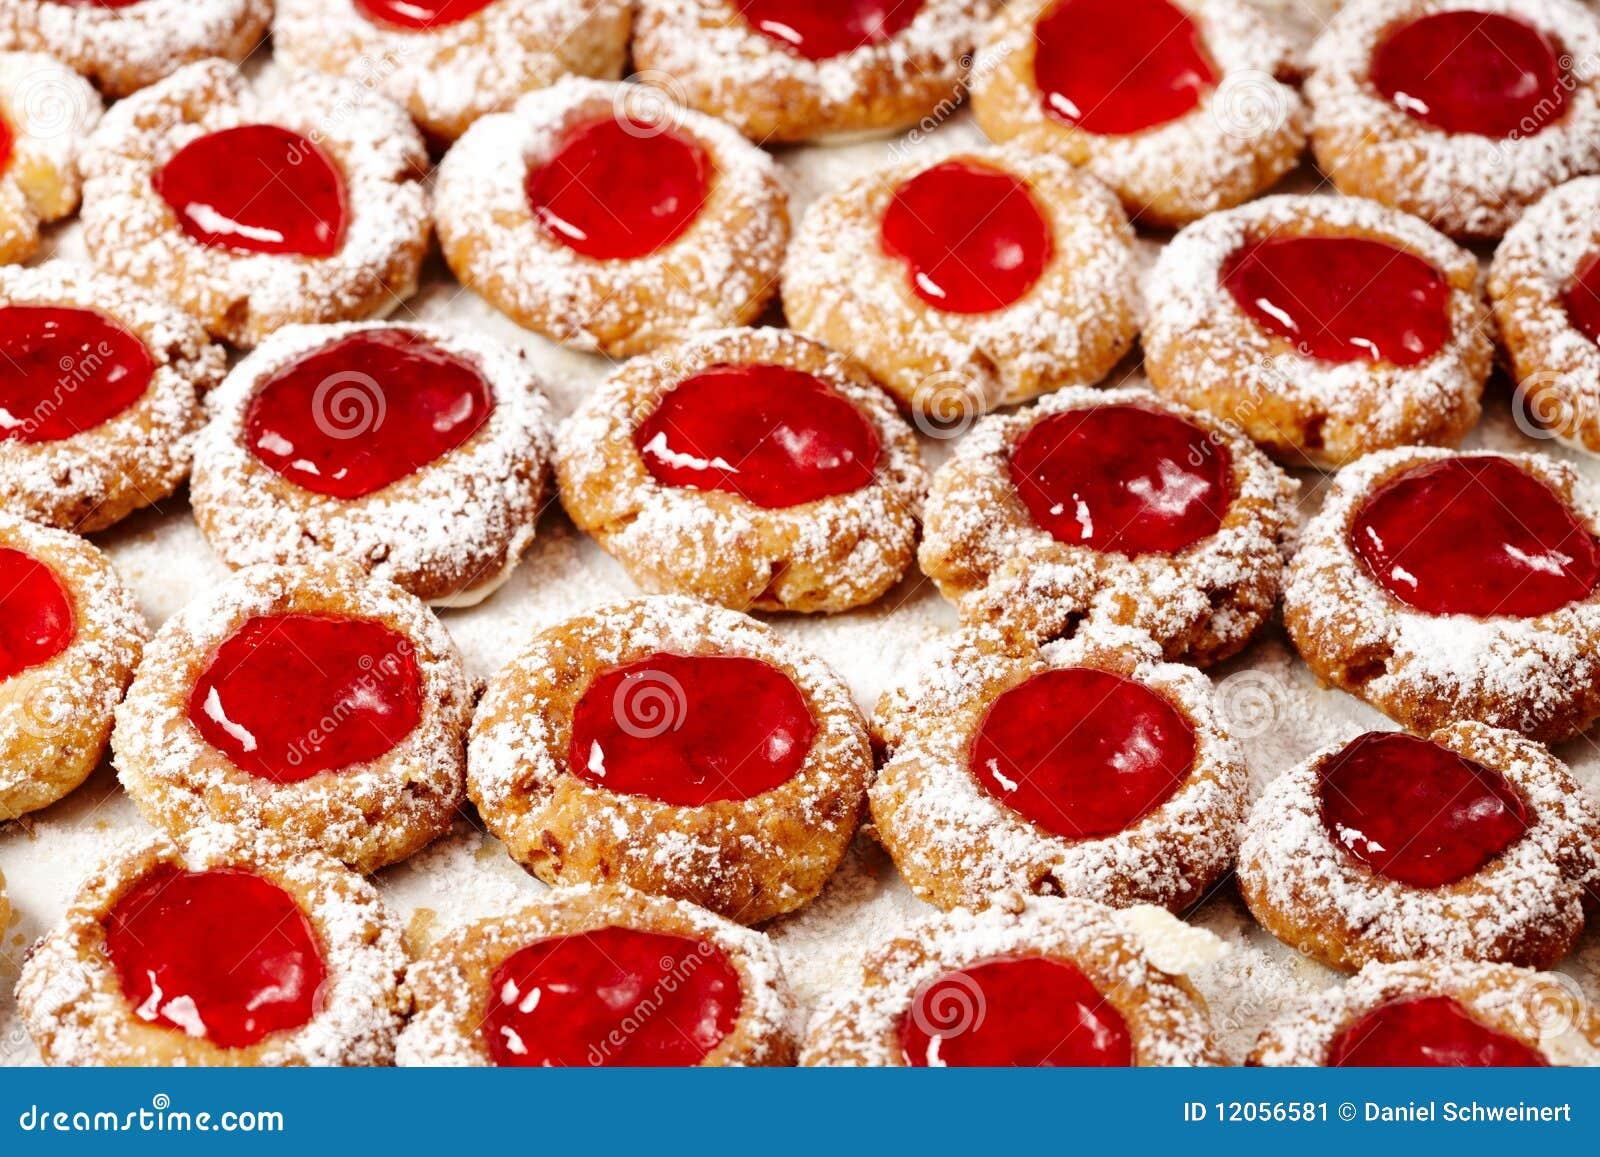 Homemade Christmas Cookies Stock Image   Image  12056581 x7w7rBoQ